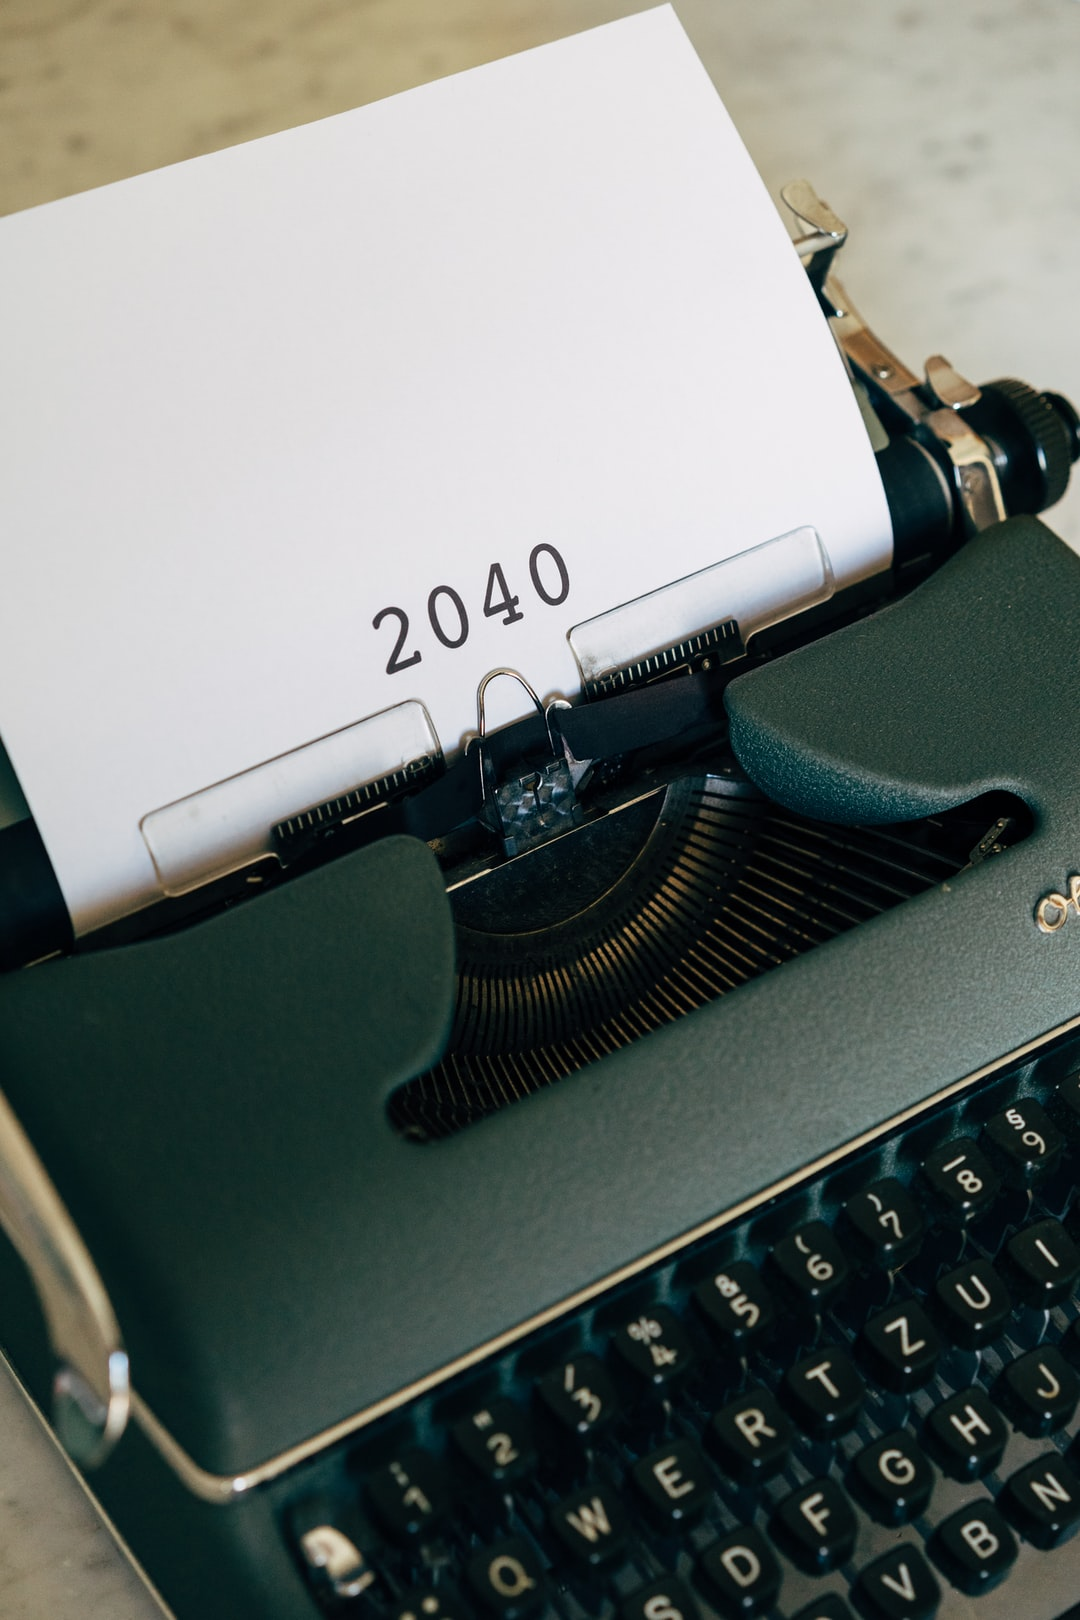 2040, twenty years in the future